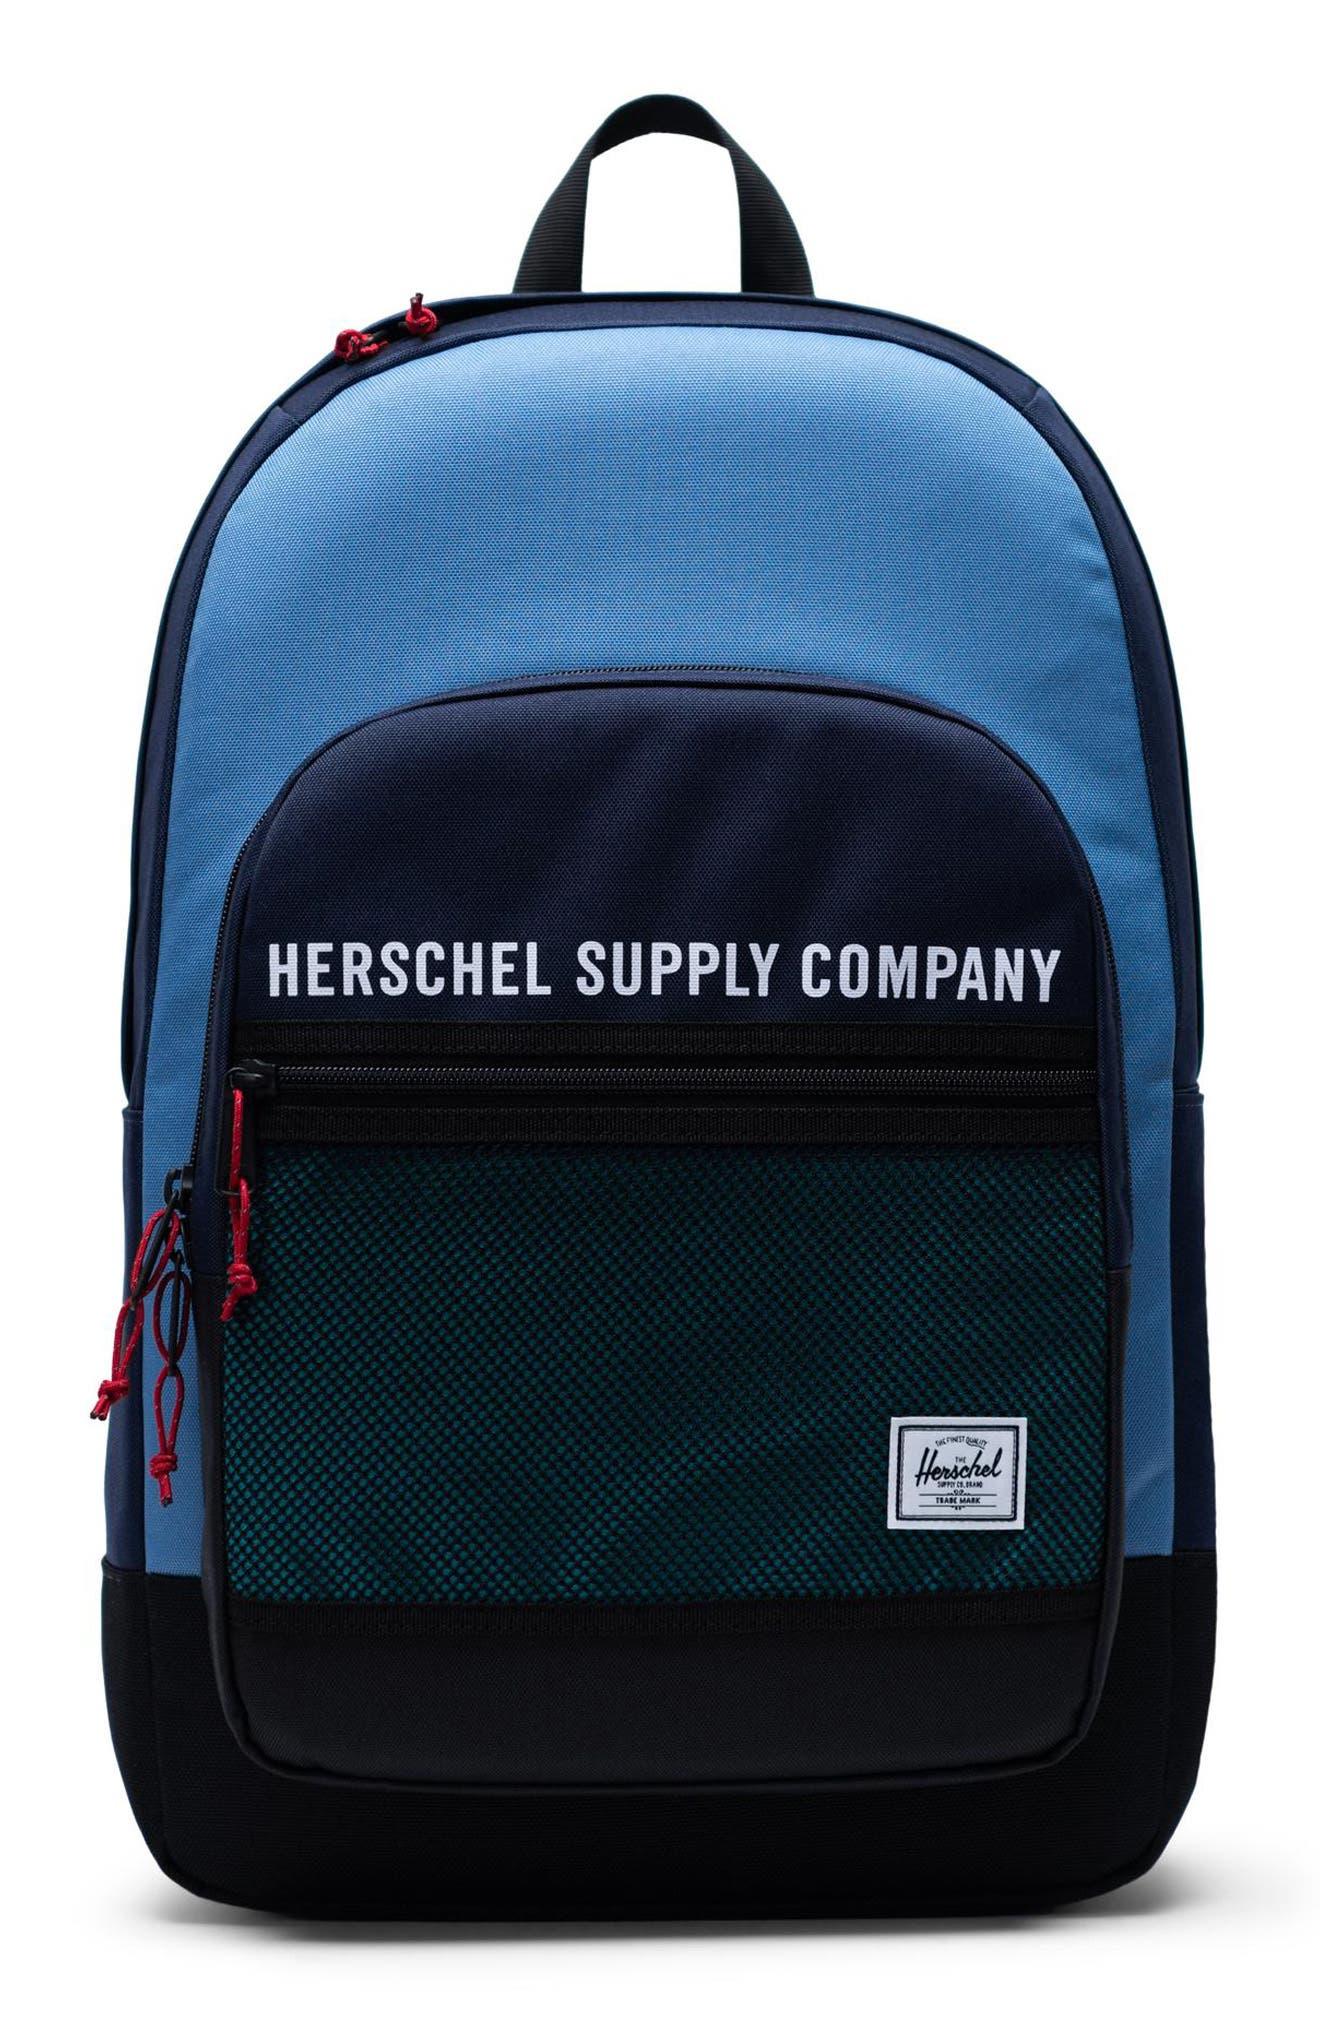 Image of Herschel Supply Co. Kaine Backpack